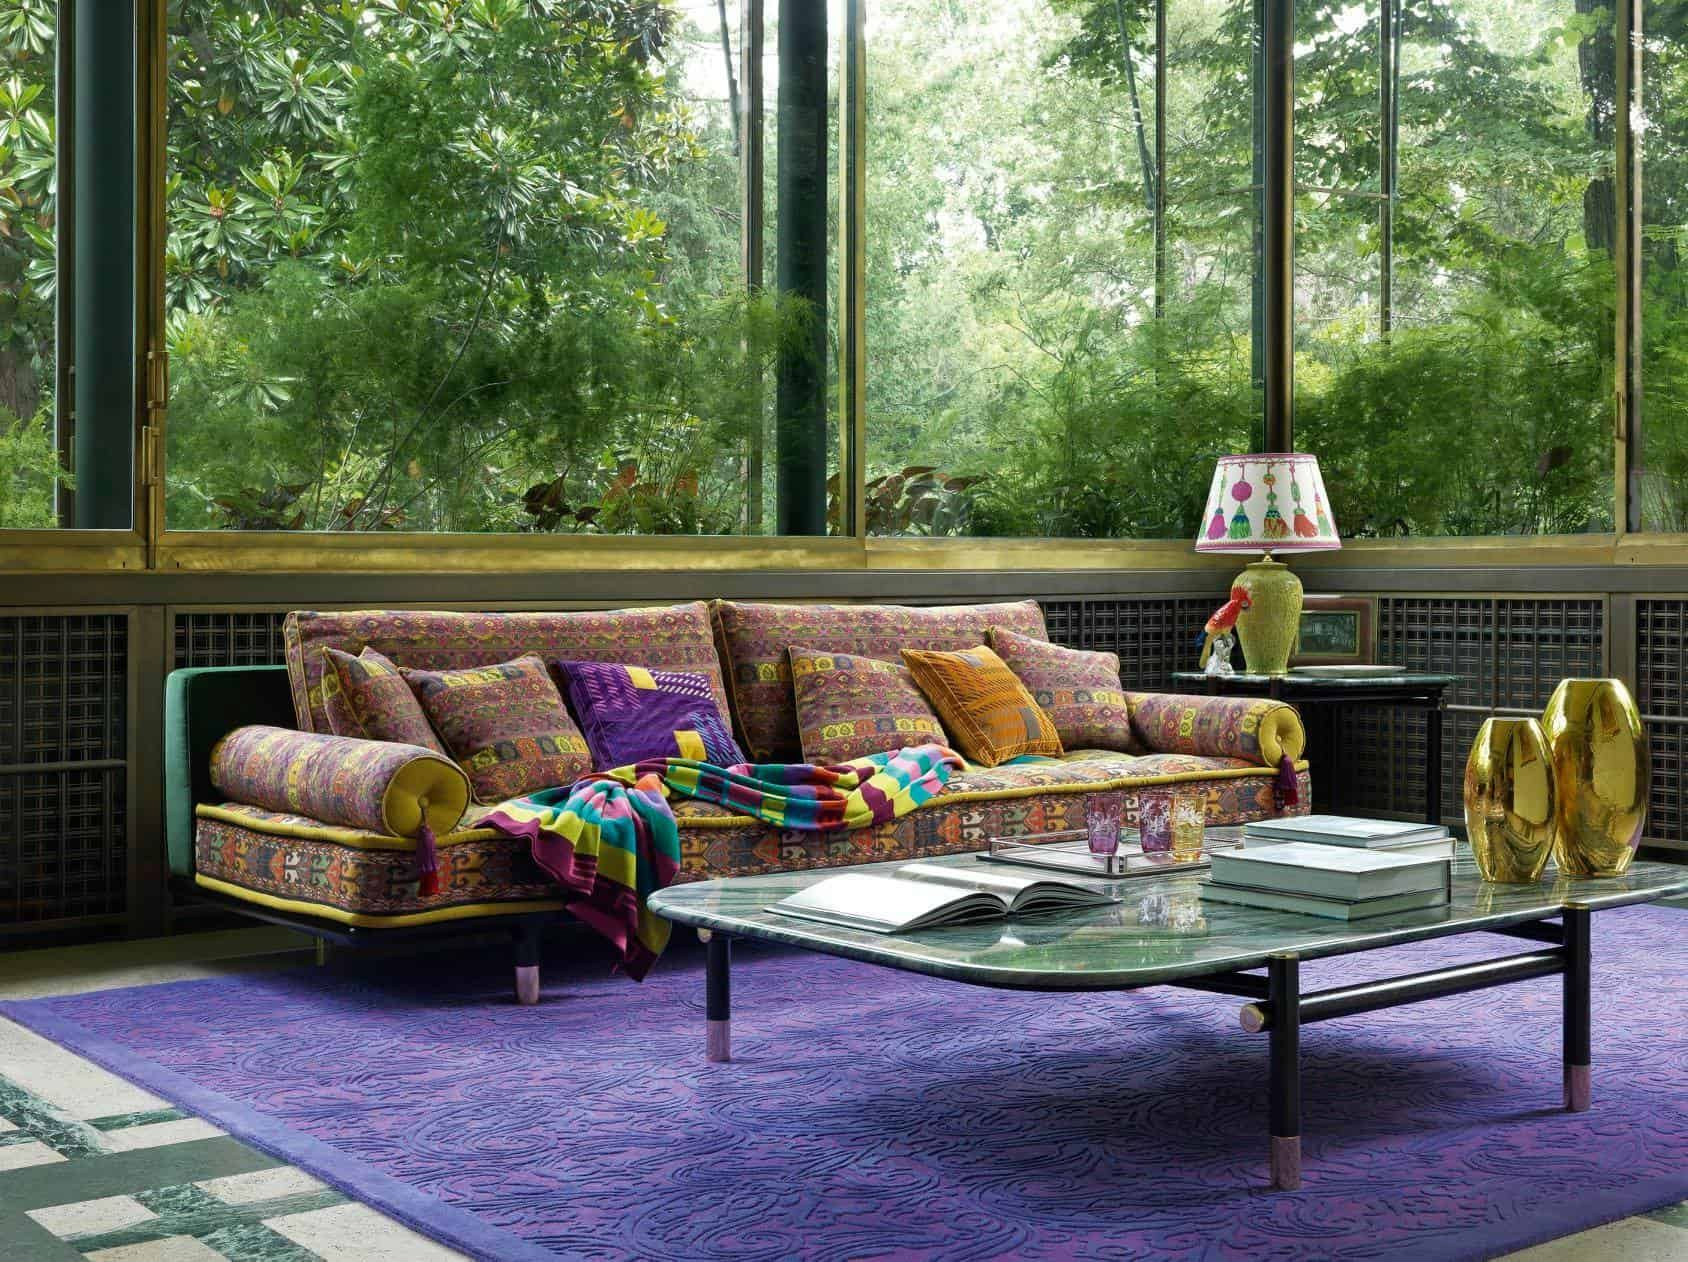 Italian Luxury Furniture Designer Furniture Singapore Da Vinci Lifestyle Outdoor Furniture Sets Etro Villa Necchi